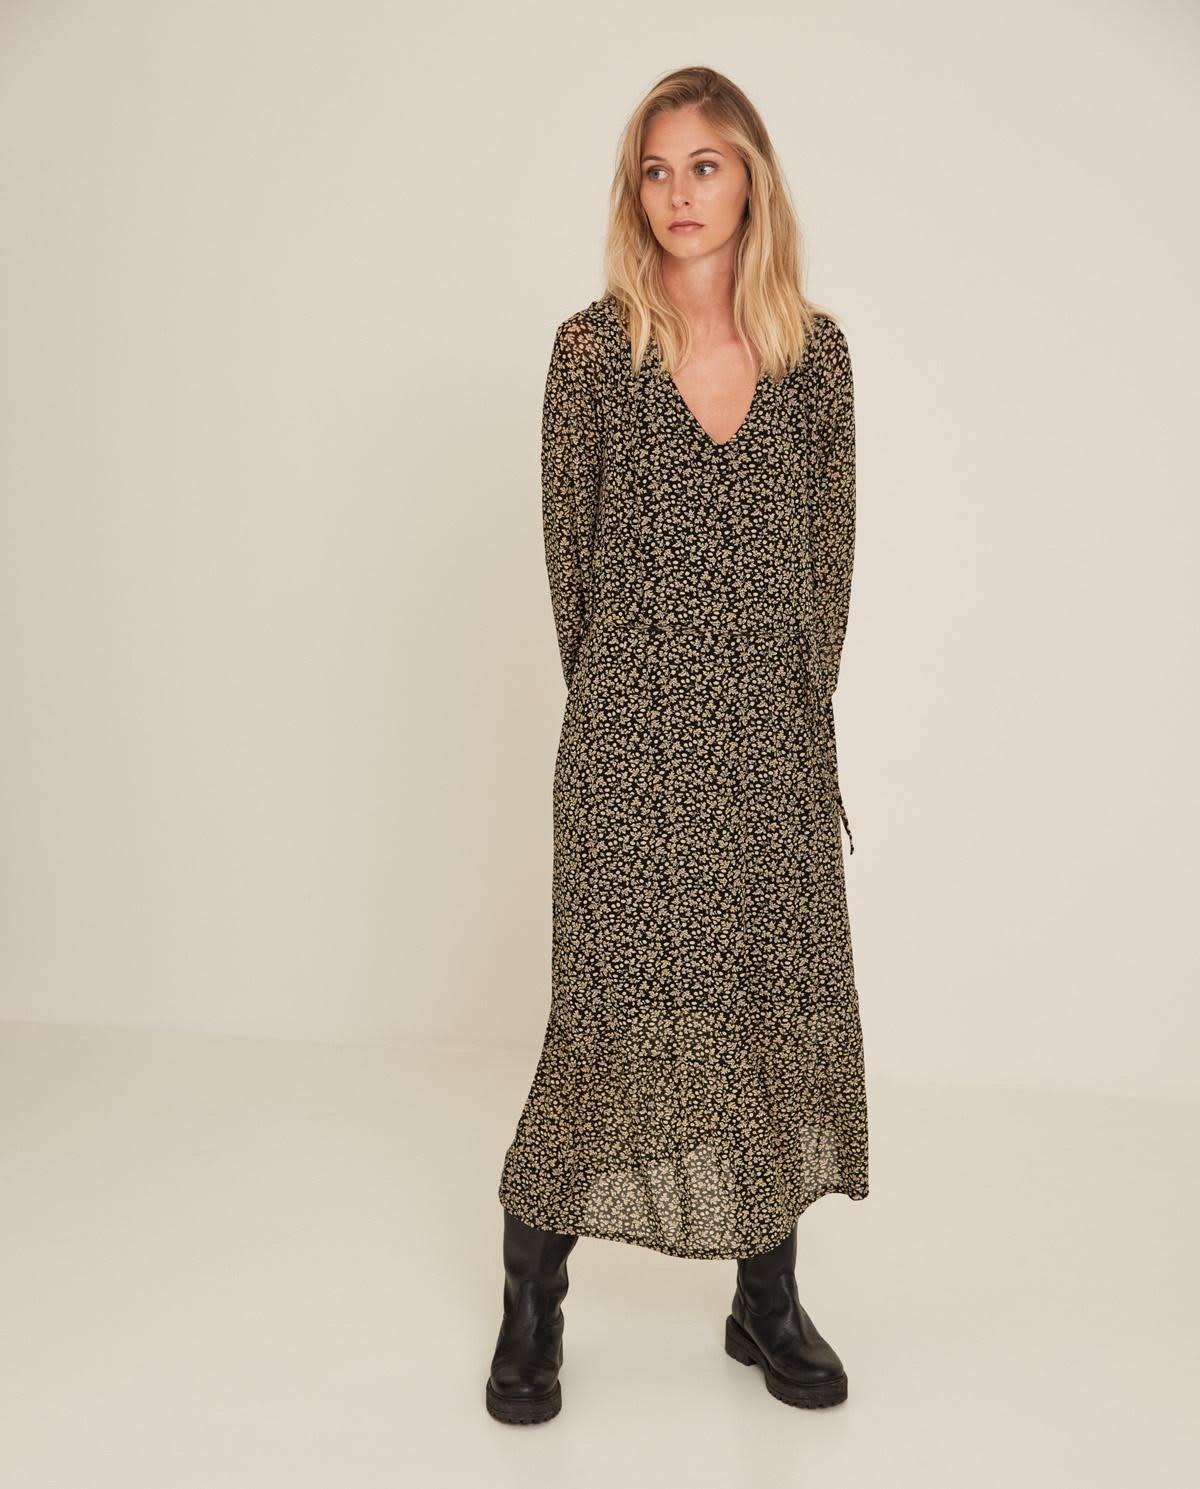 Yerse Leah33 - Dress